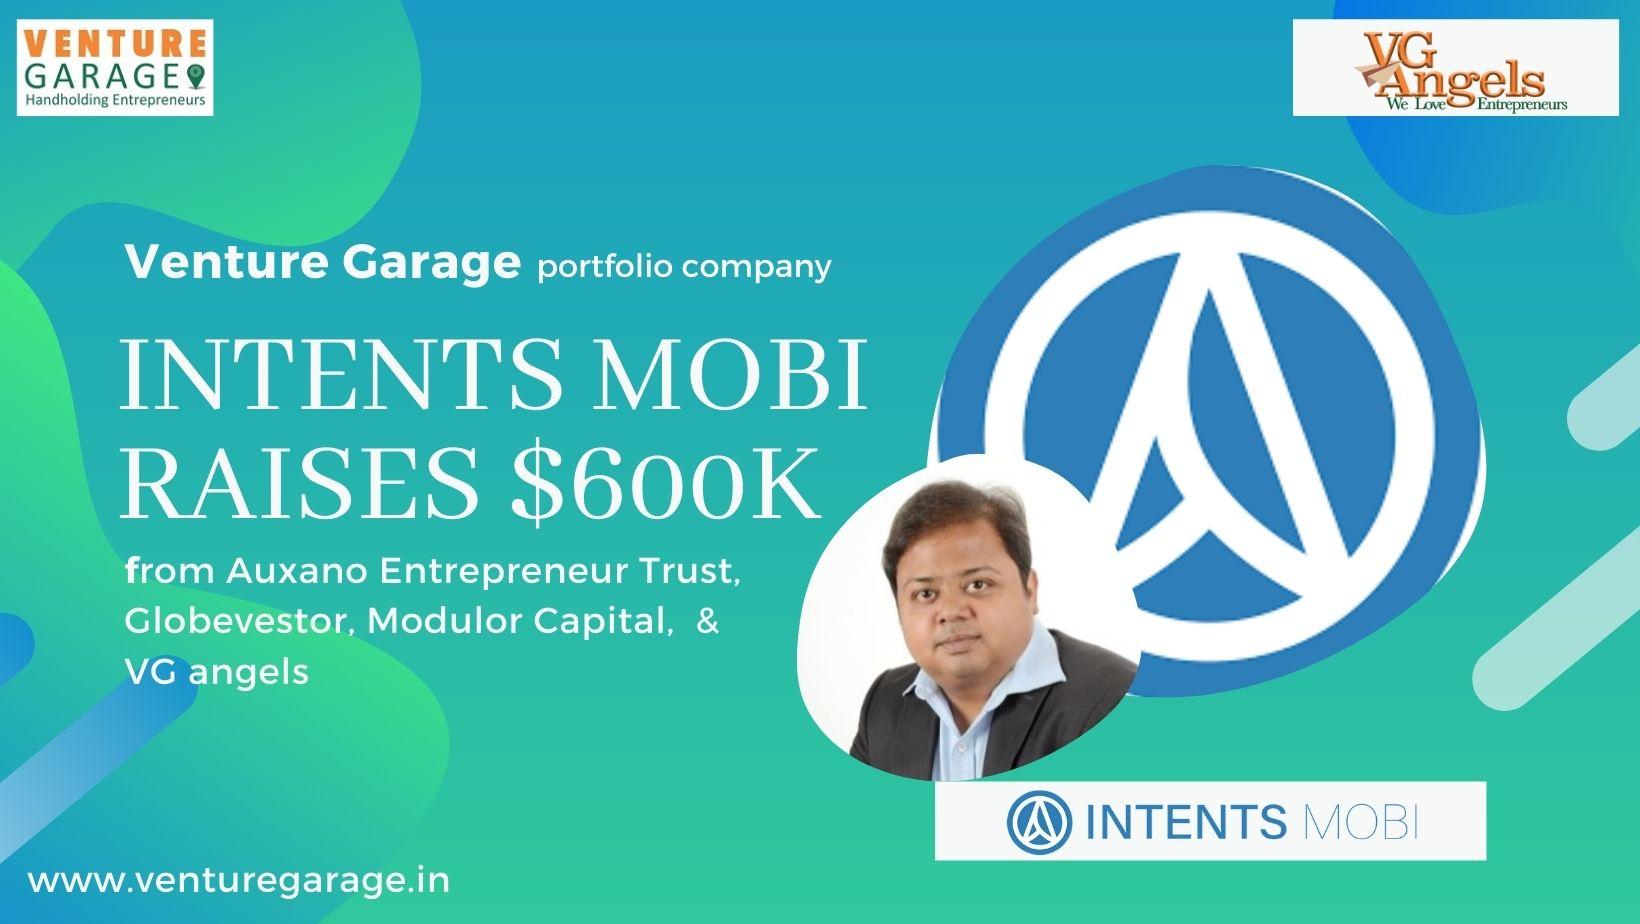 Intentsmobi raises $600k